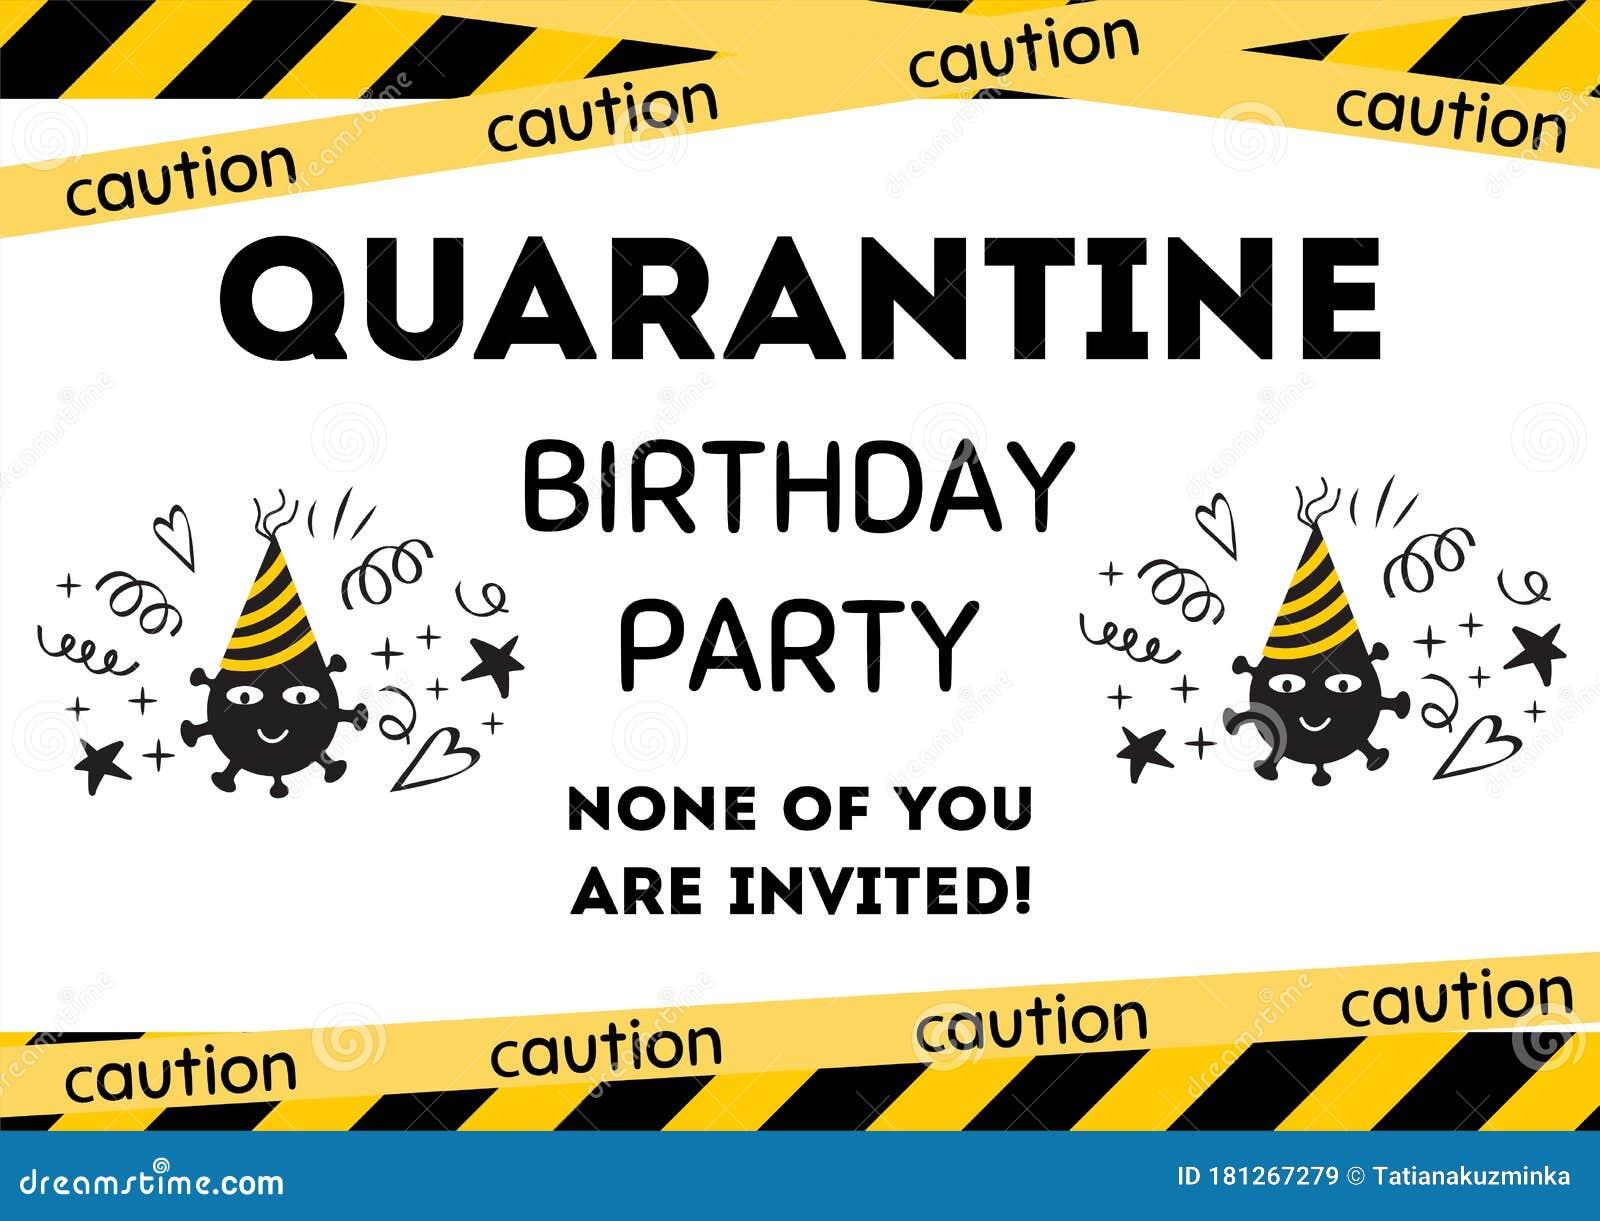 Quarantine Birthday Party Invitation Yellow Black Birthday Card With Symbol Coronavirus Home Online Party Banner Stock Illustration Illustration Of Happy Background 181267279